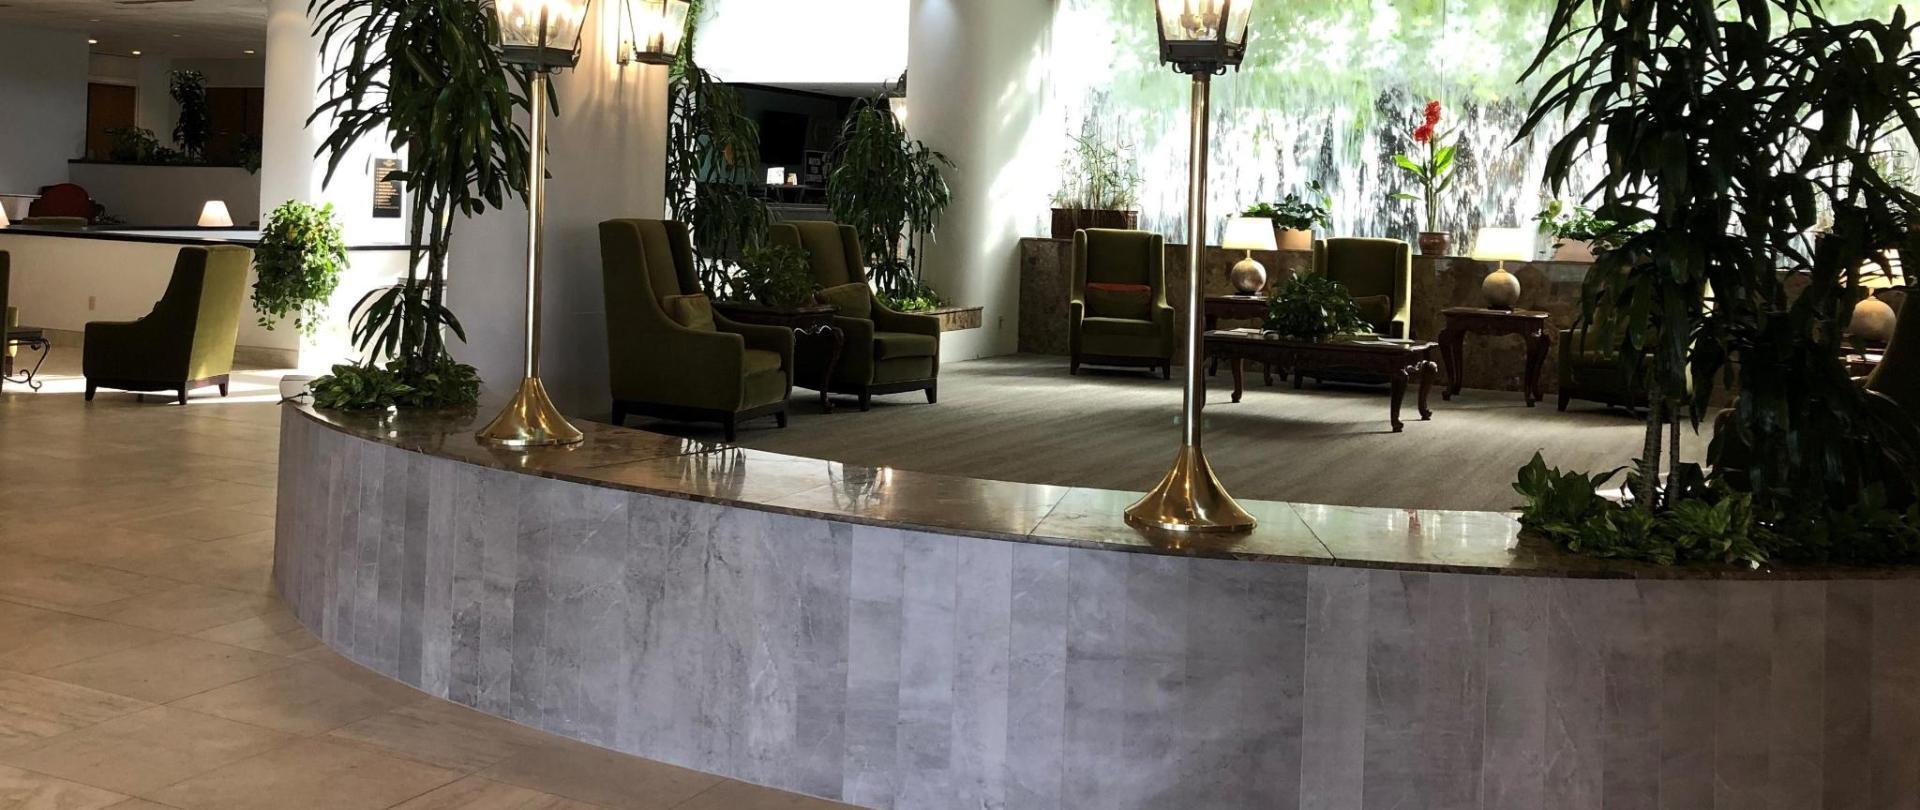 New Lobby (3).jpg